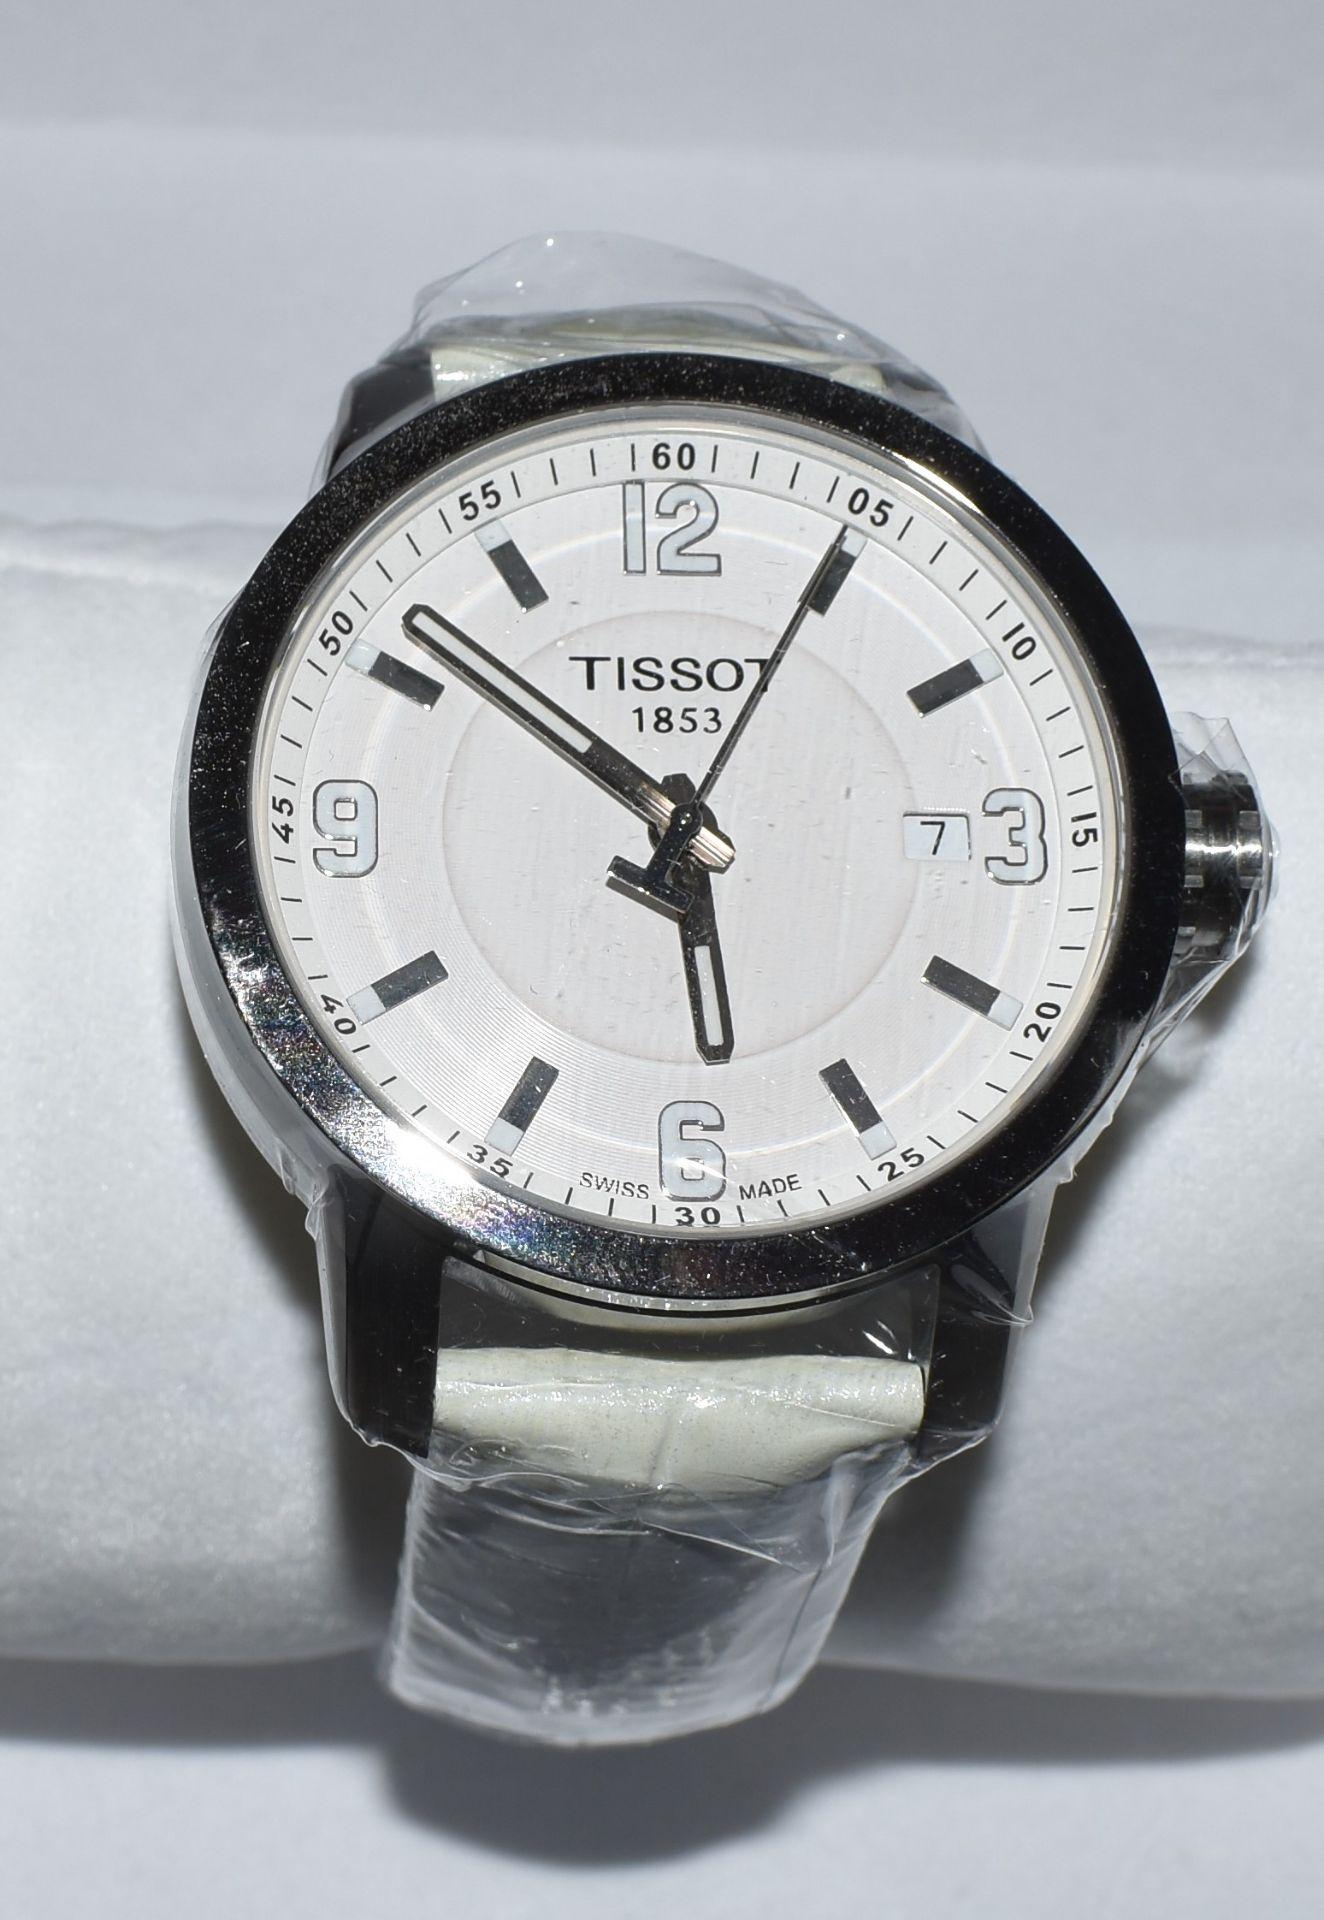 Tissot Men's Watch TO55.410.16.017.00 - Image 2 of 3